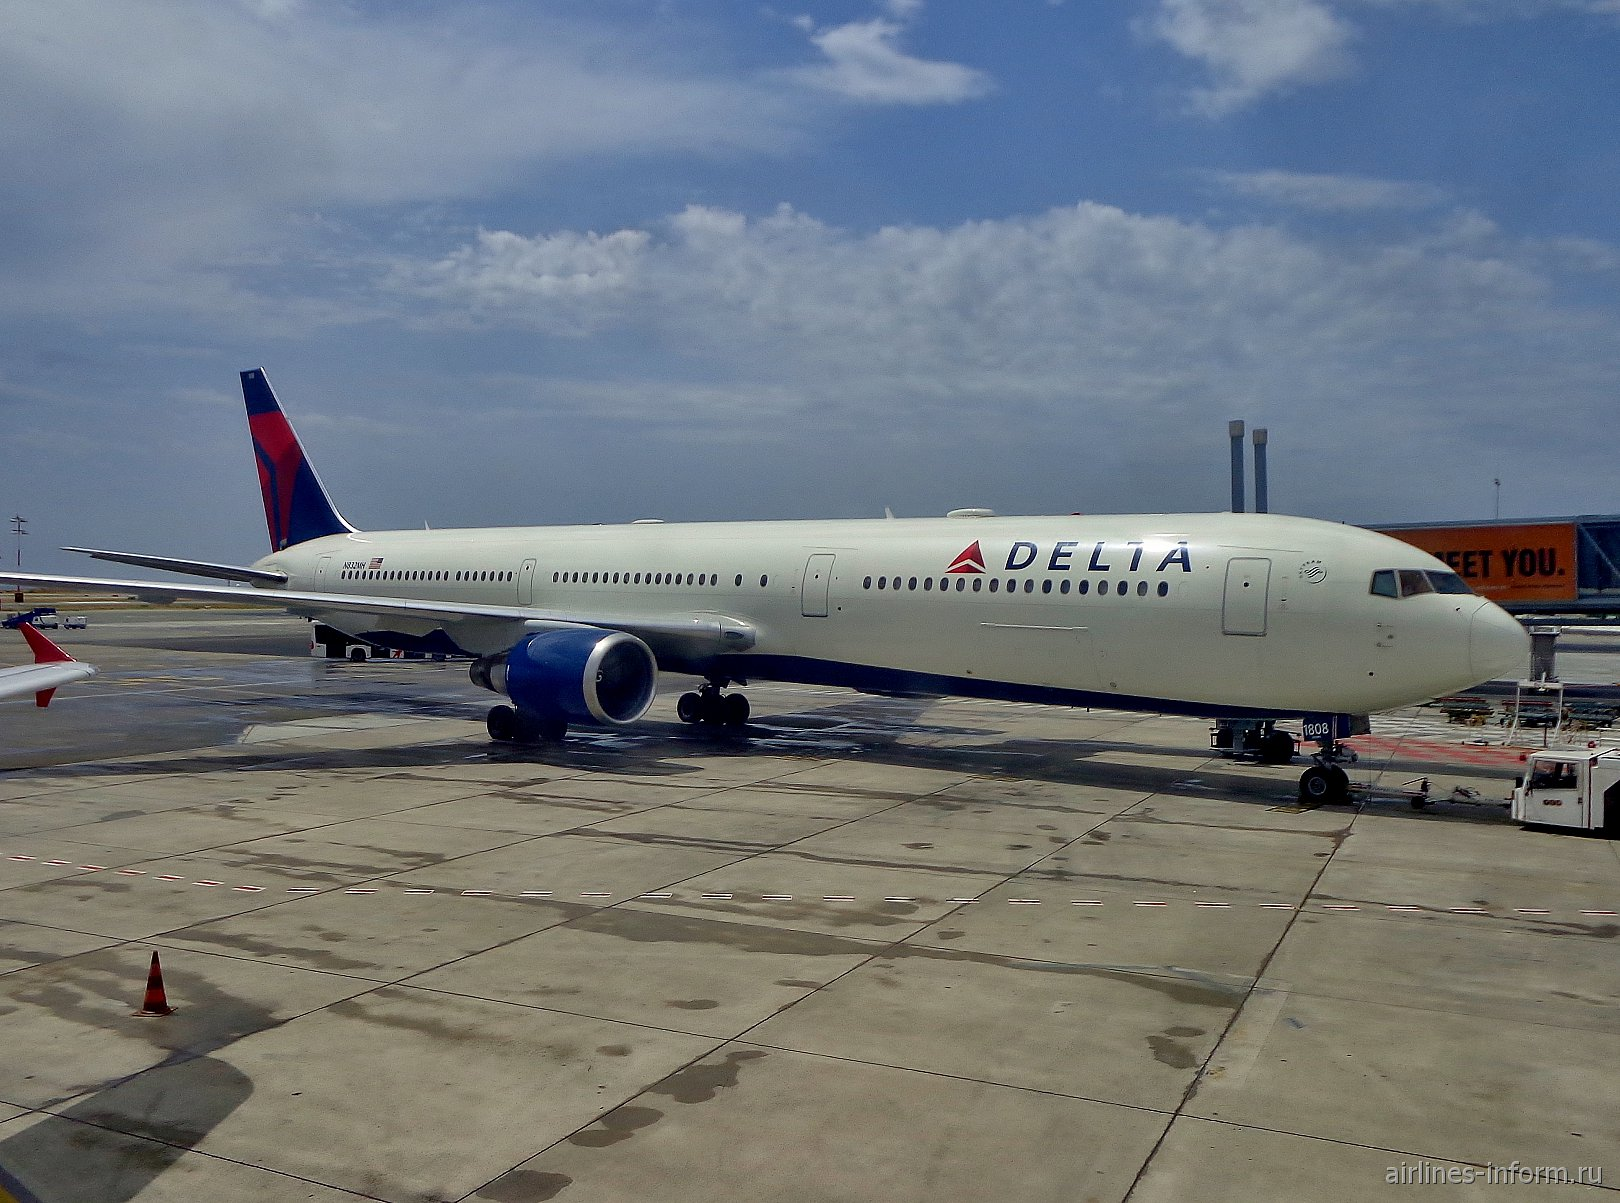 Самолет Боинг-767-300 авиакомпании Delta Air Lines в аэропорту Ниццы